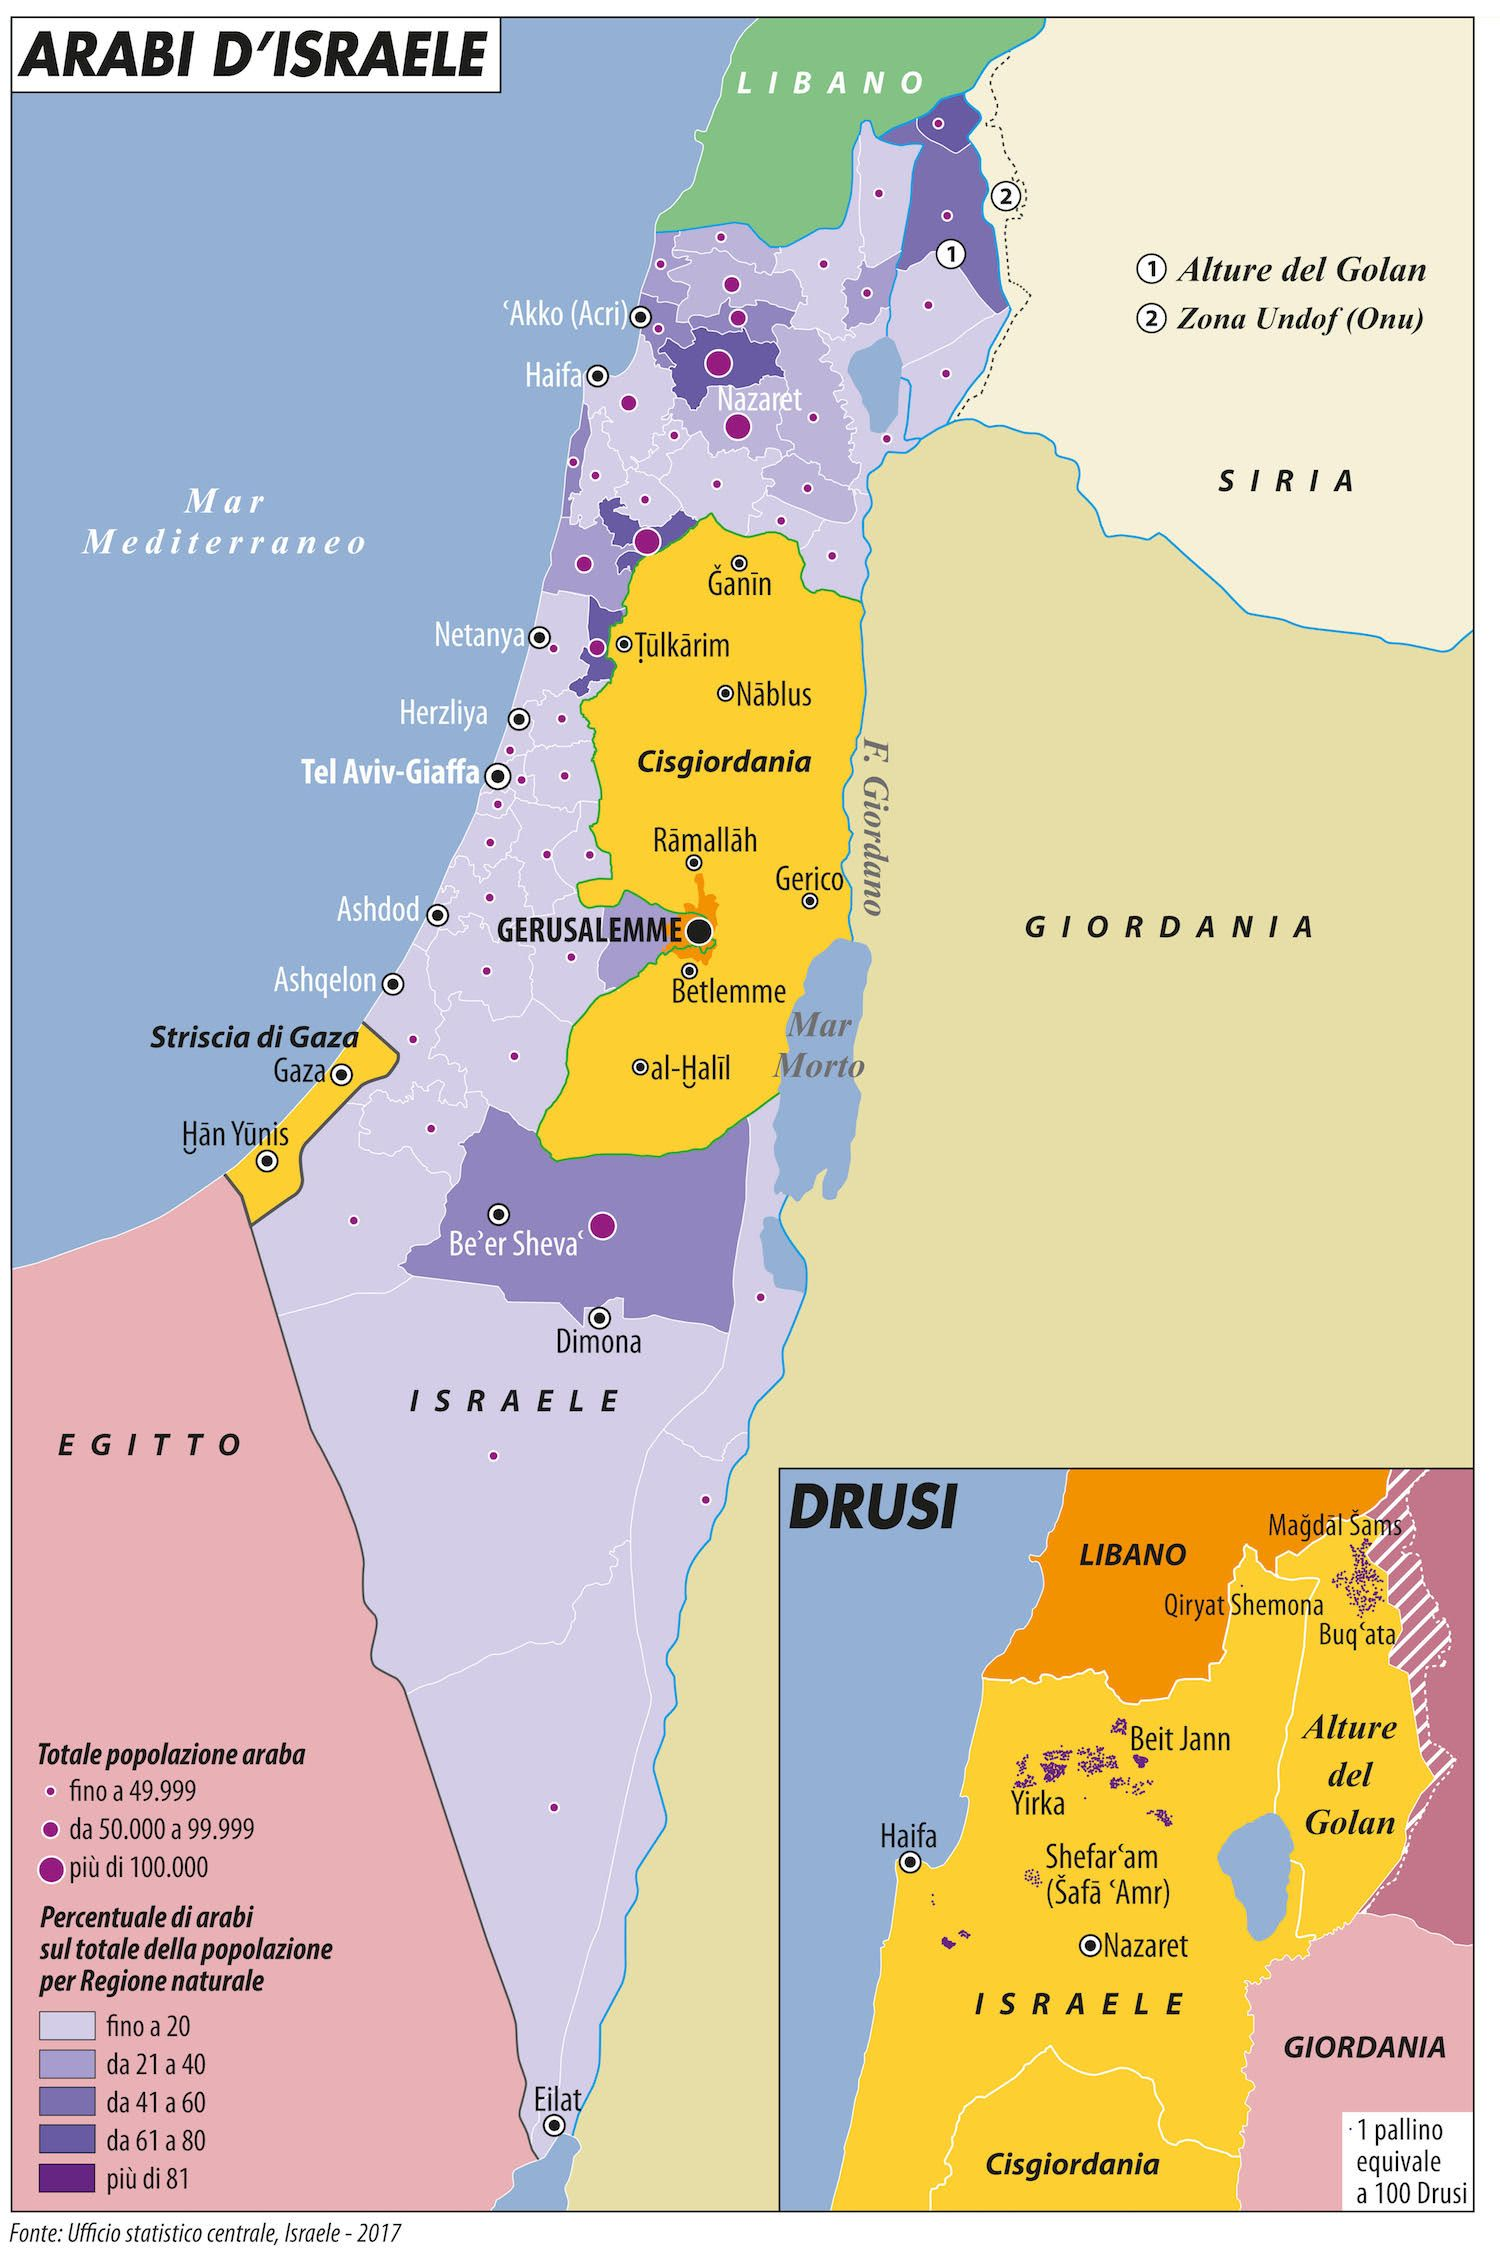 Cartina Israele E Palestina Oggi.Notizie Dal Medio Oriente Israele Gaza Libano Limes